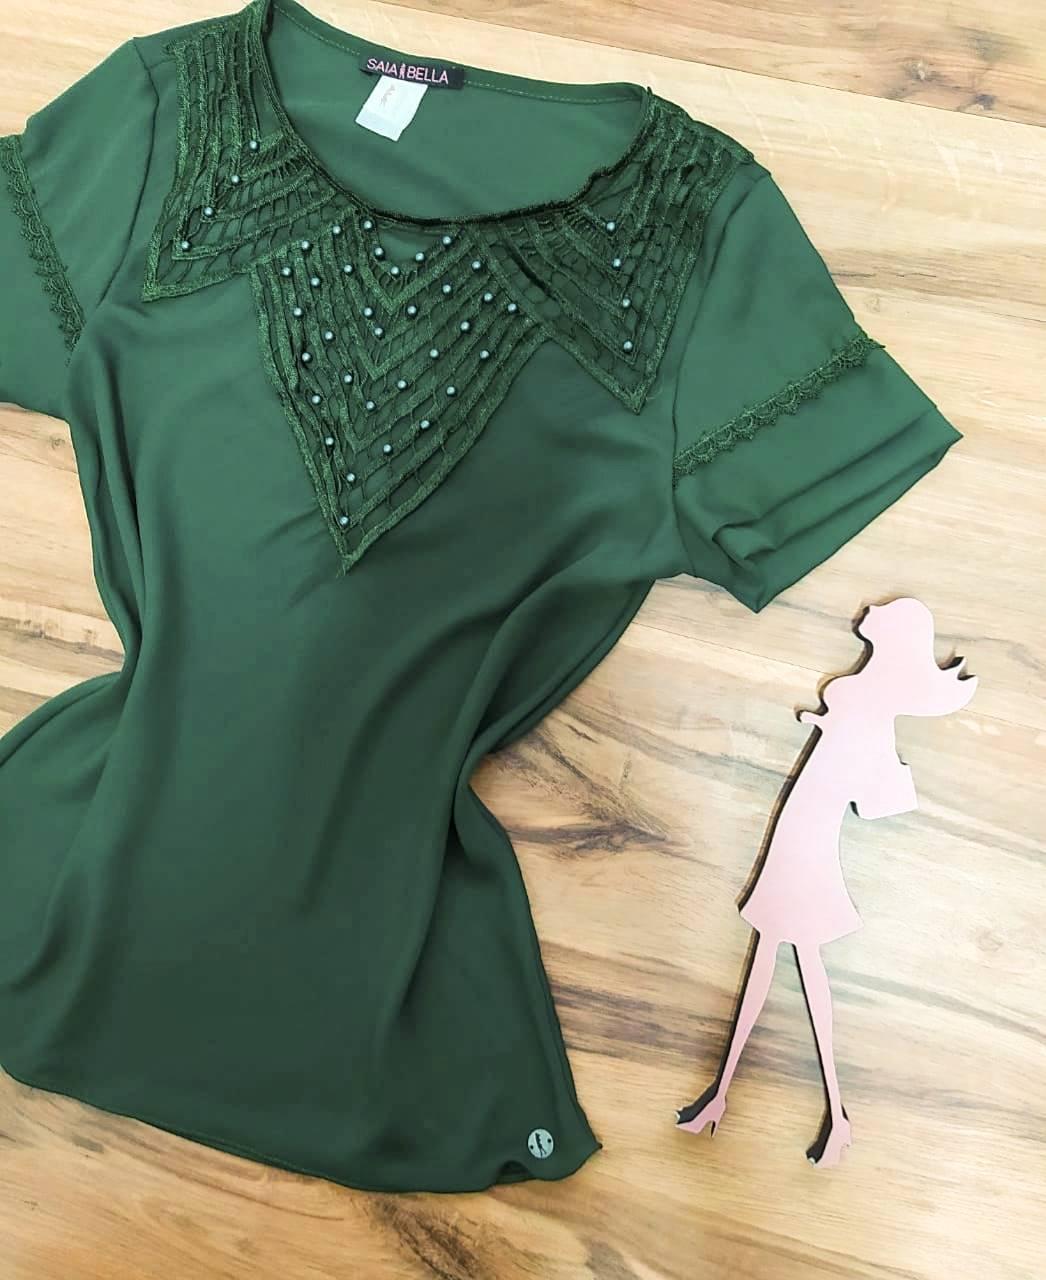 Blusa Nataly de Renda Saia Bella - SB774017 - Verde Militar